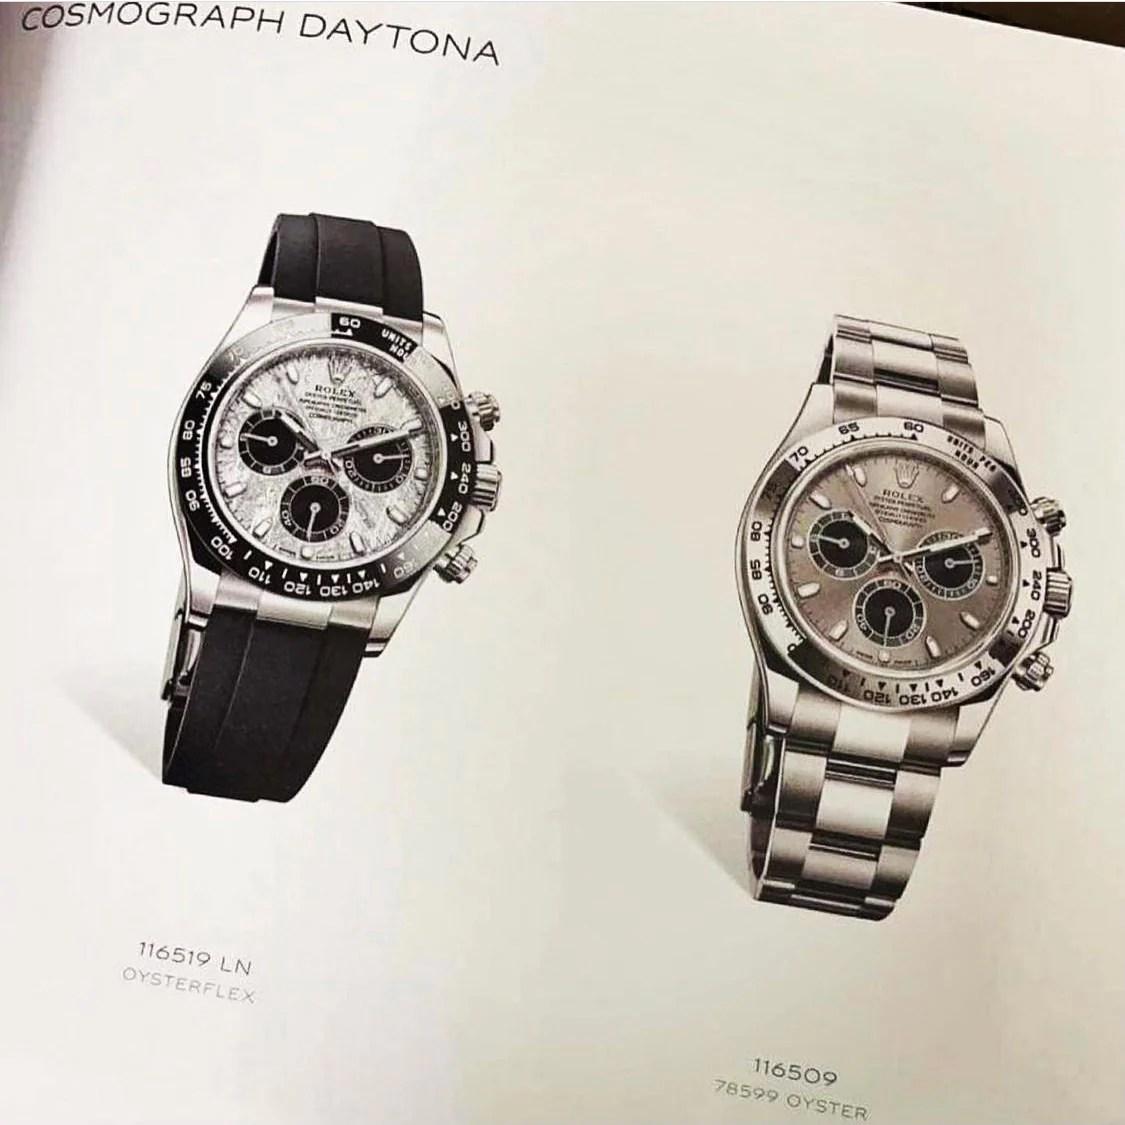 Rolex Daytona Meteorite Dial on Oysterflex